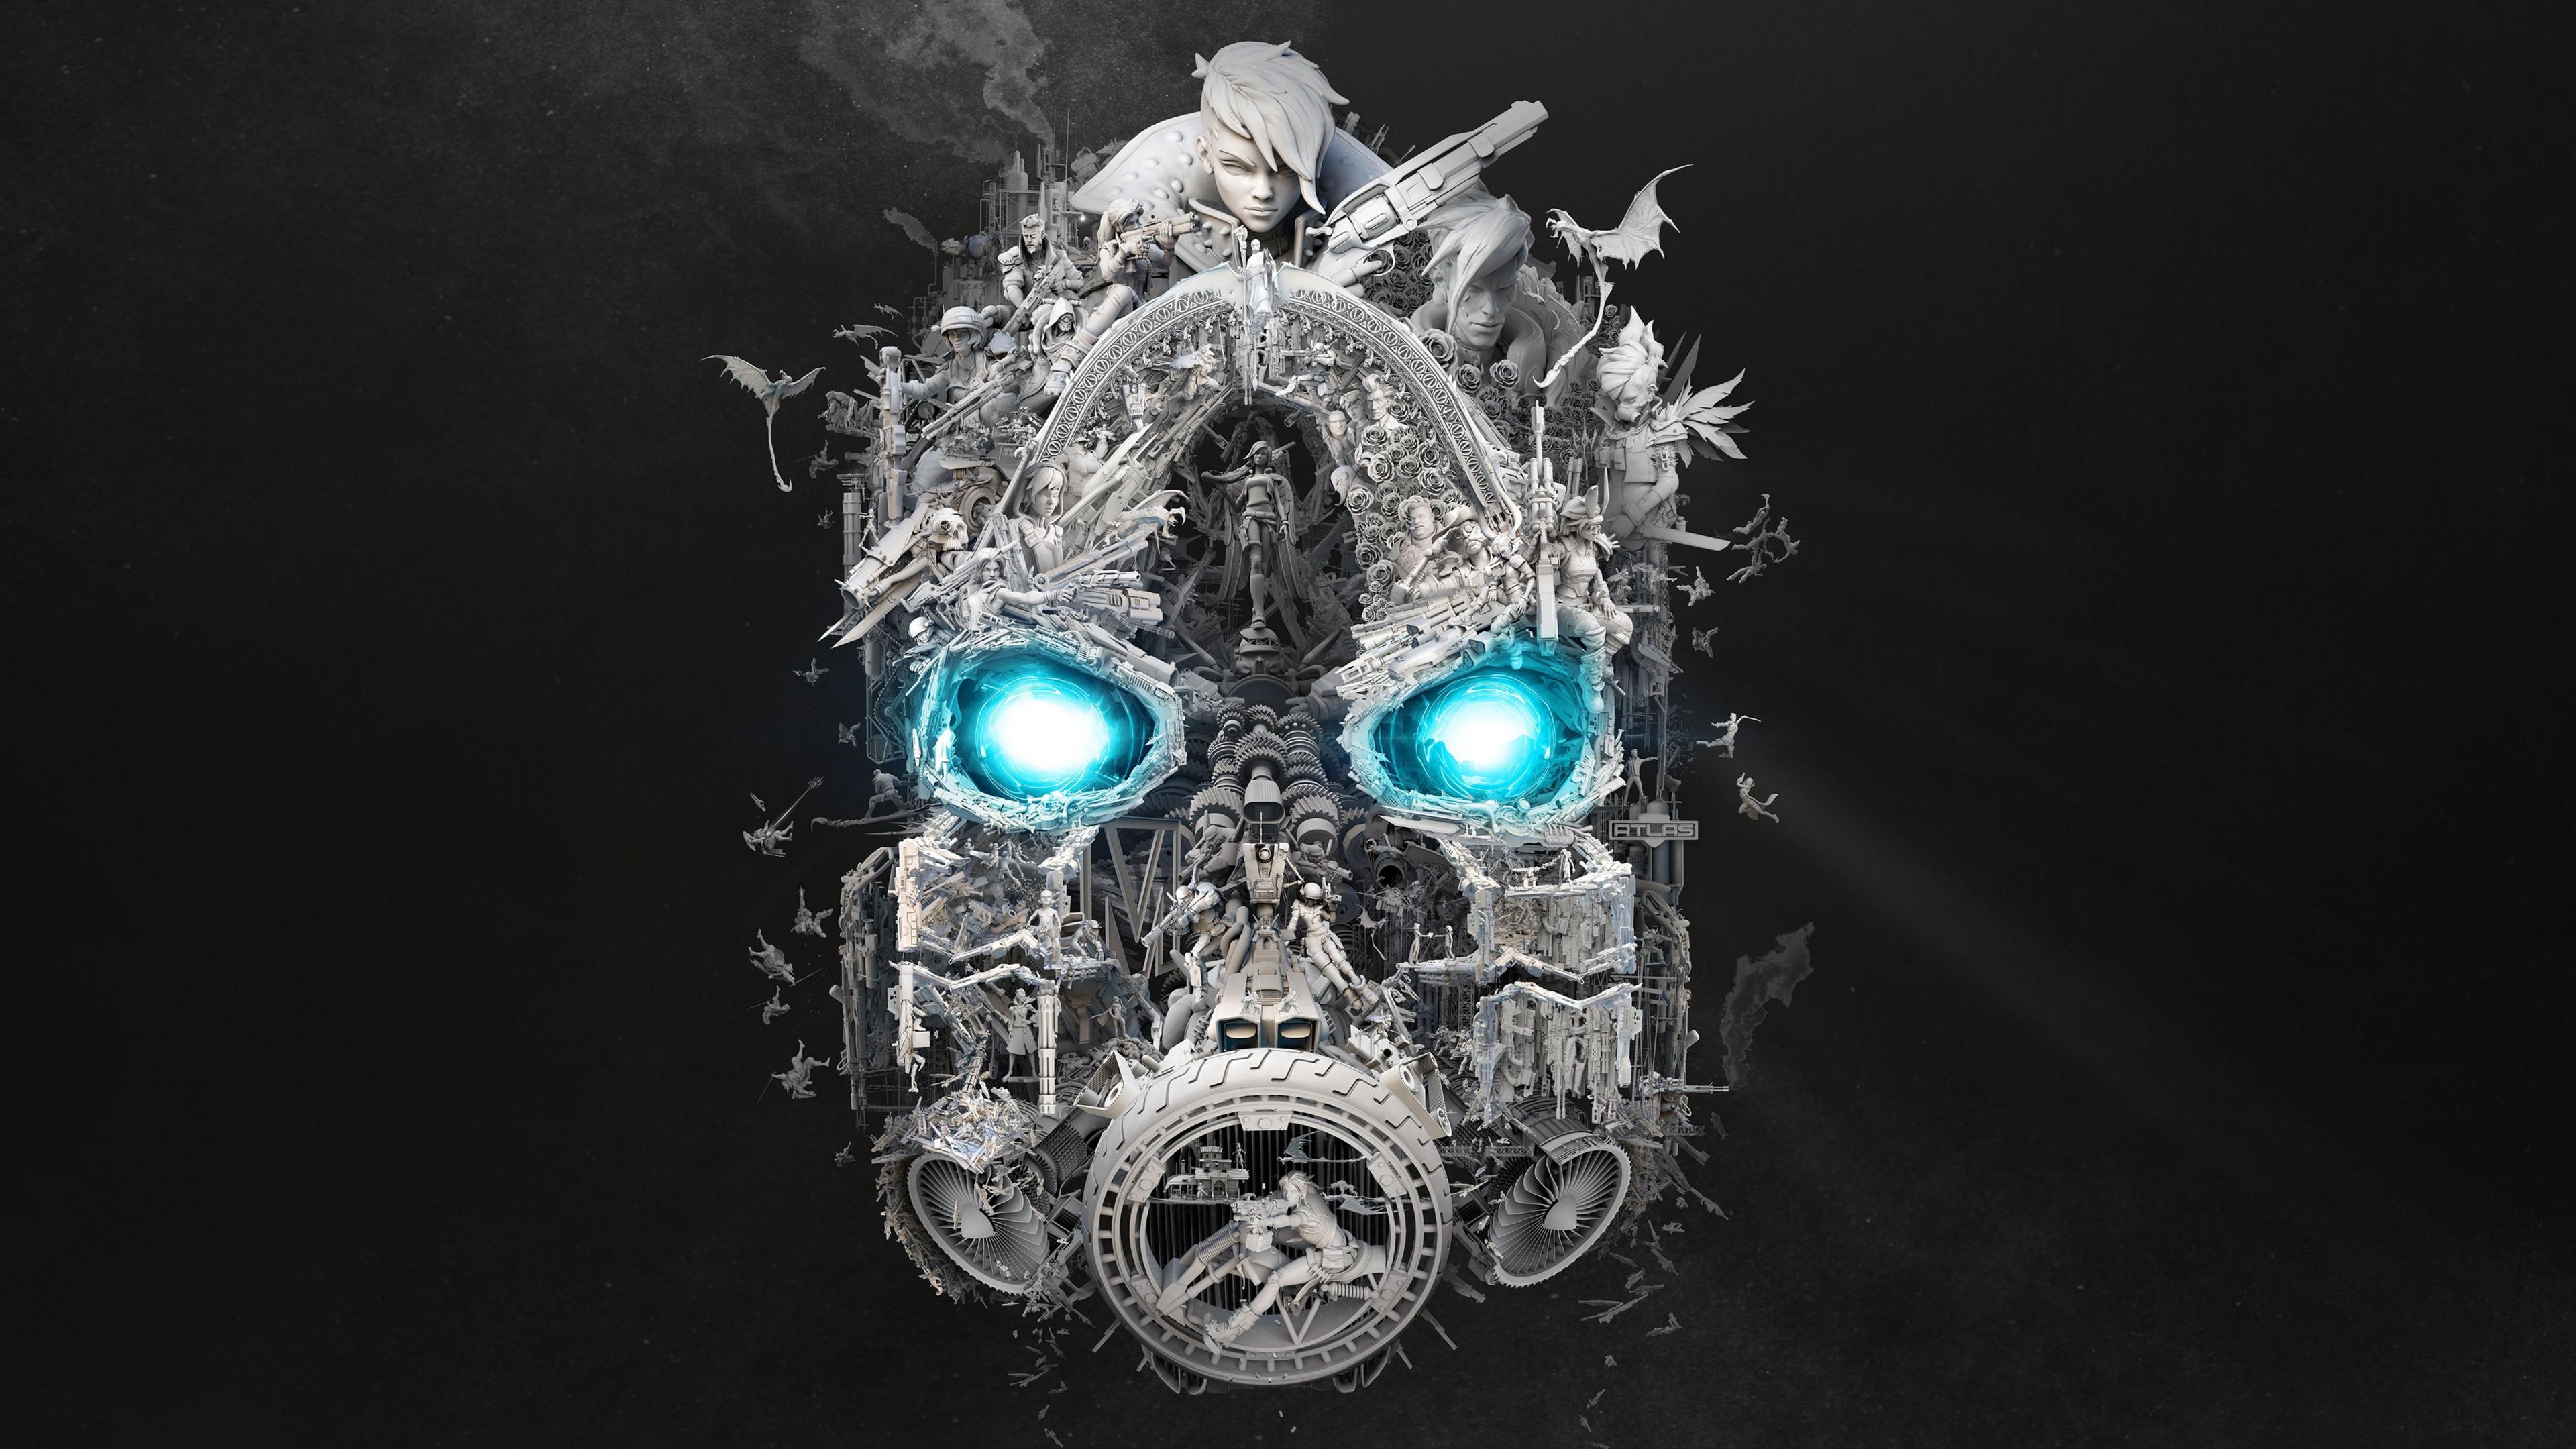 Tomb Raider Iphone 5 Wallpaper Borderlands 3 Mask Of Mayhem 5k Wallpapers Hd Wallpapers